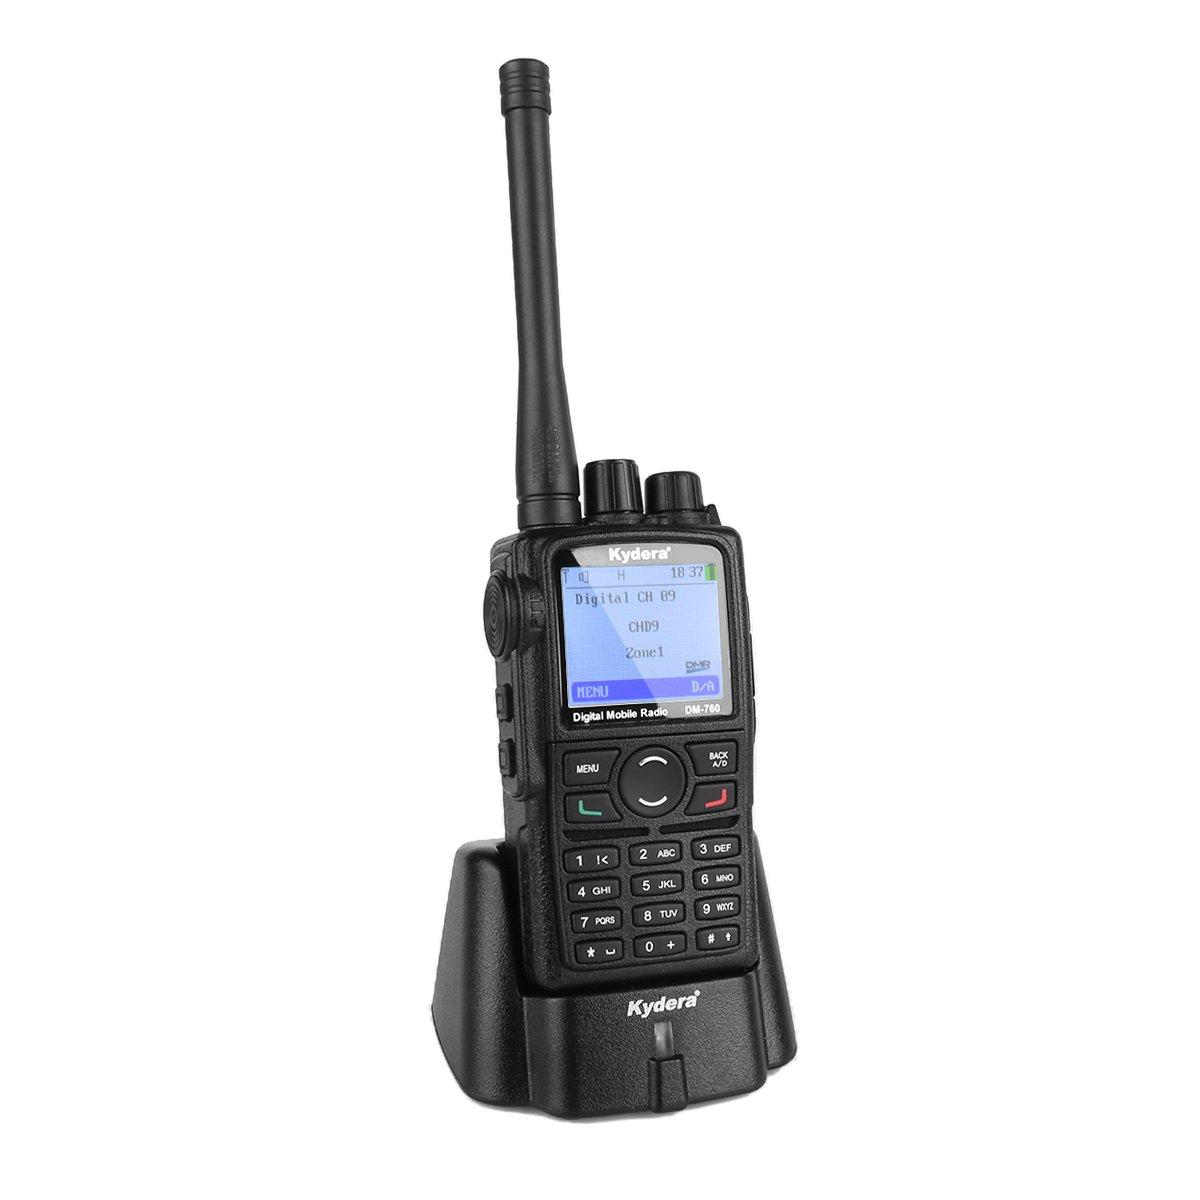 Kydera DM-760 DMR Digital Radio 400-480MHz UHF Walkie Talkie 2000mAh 5W, Compatible With Motorola